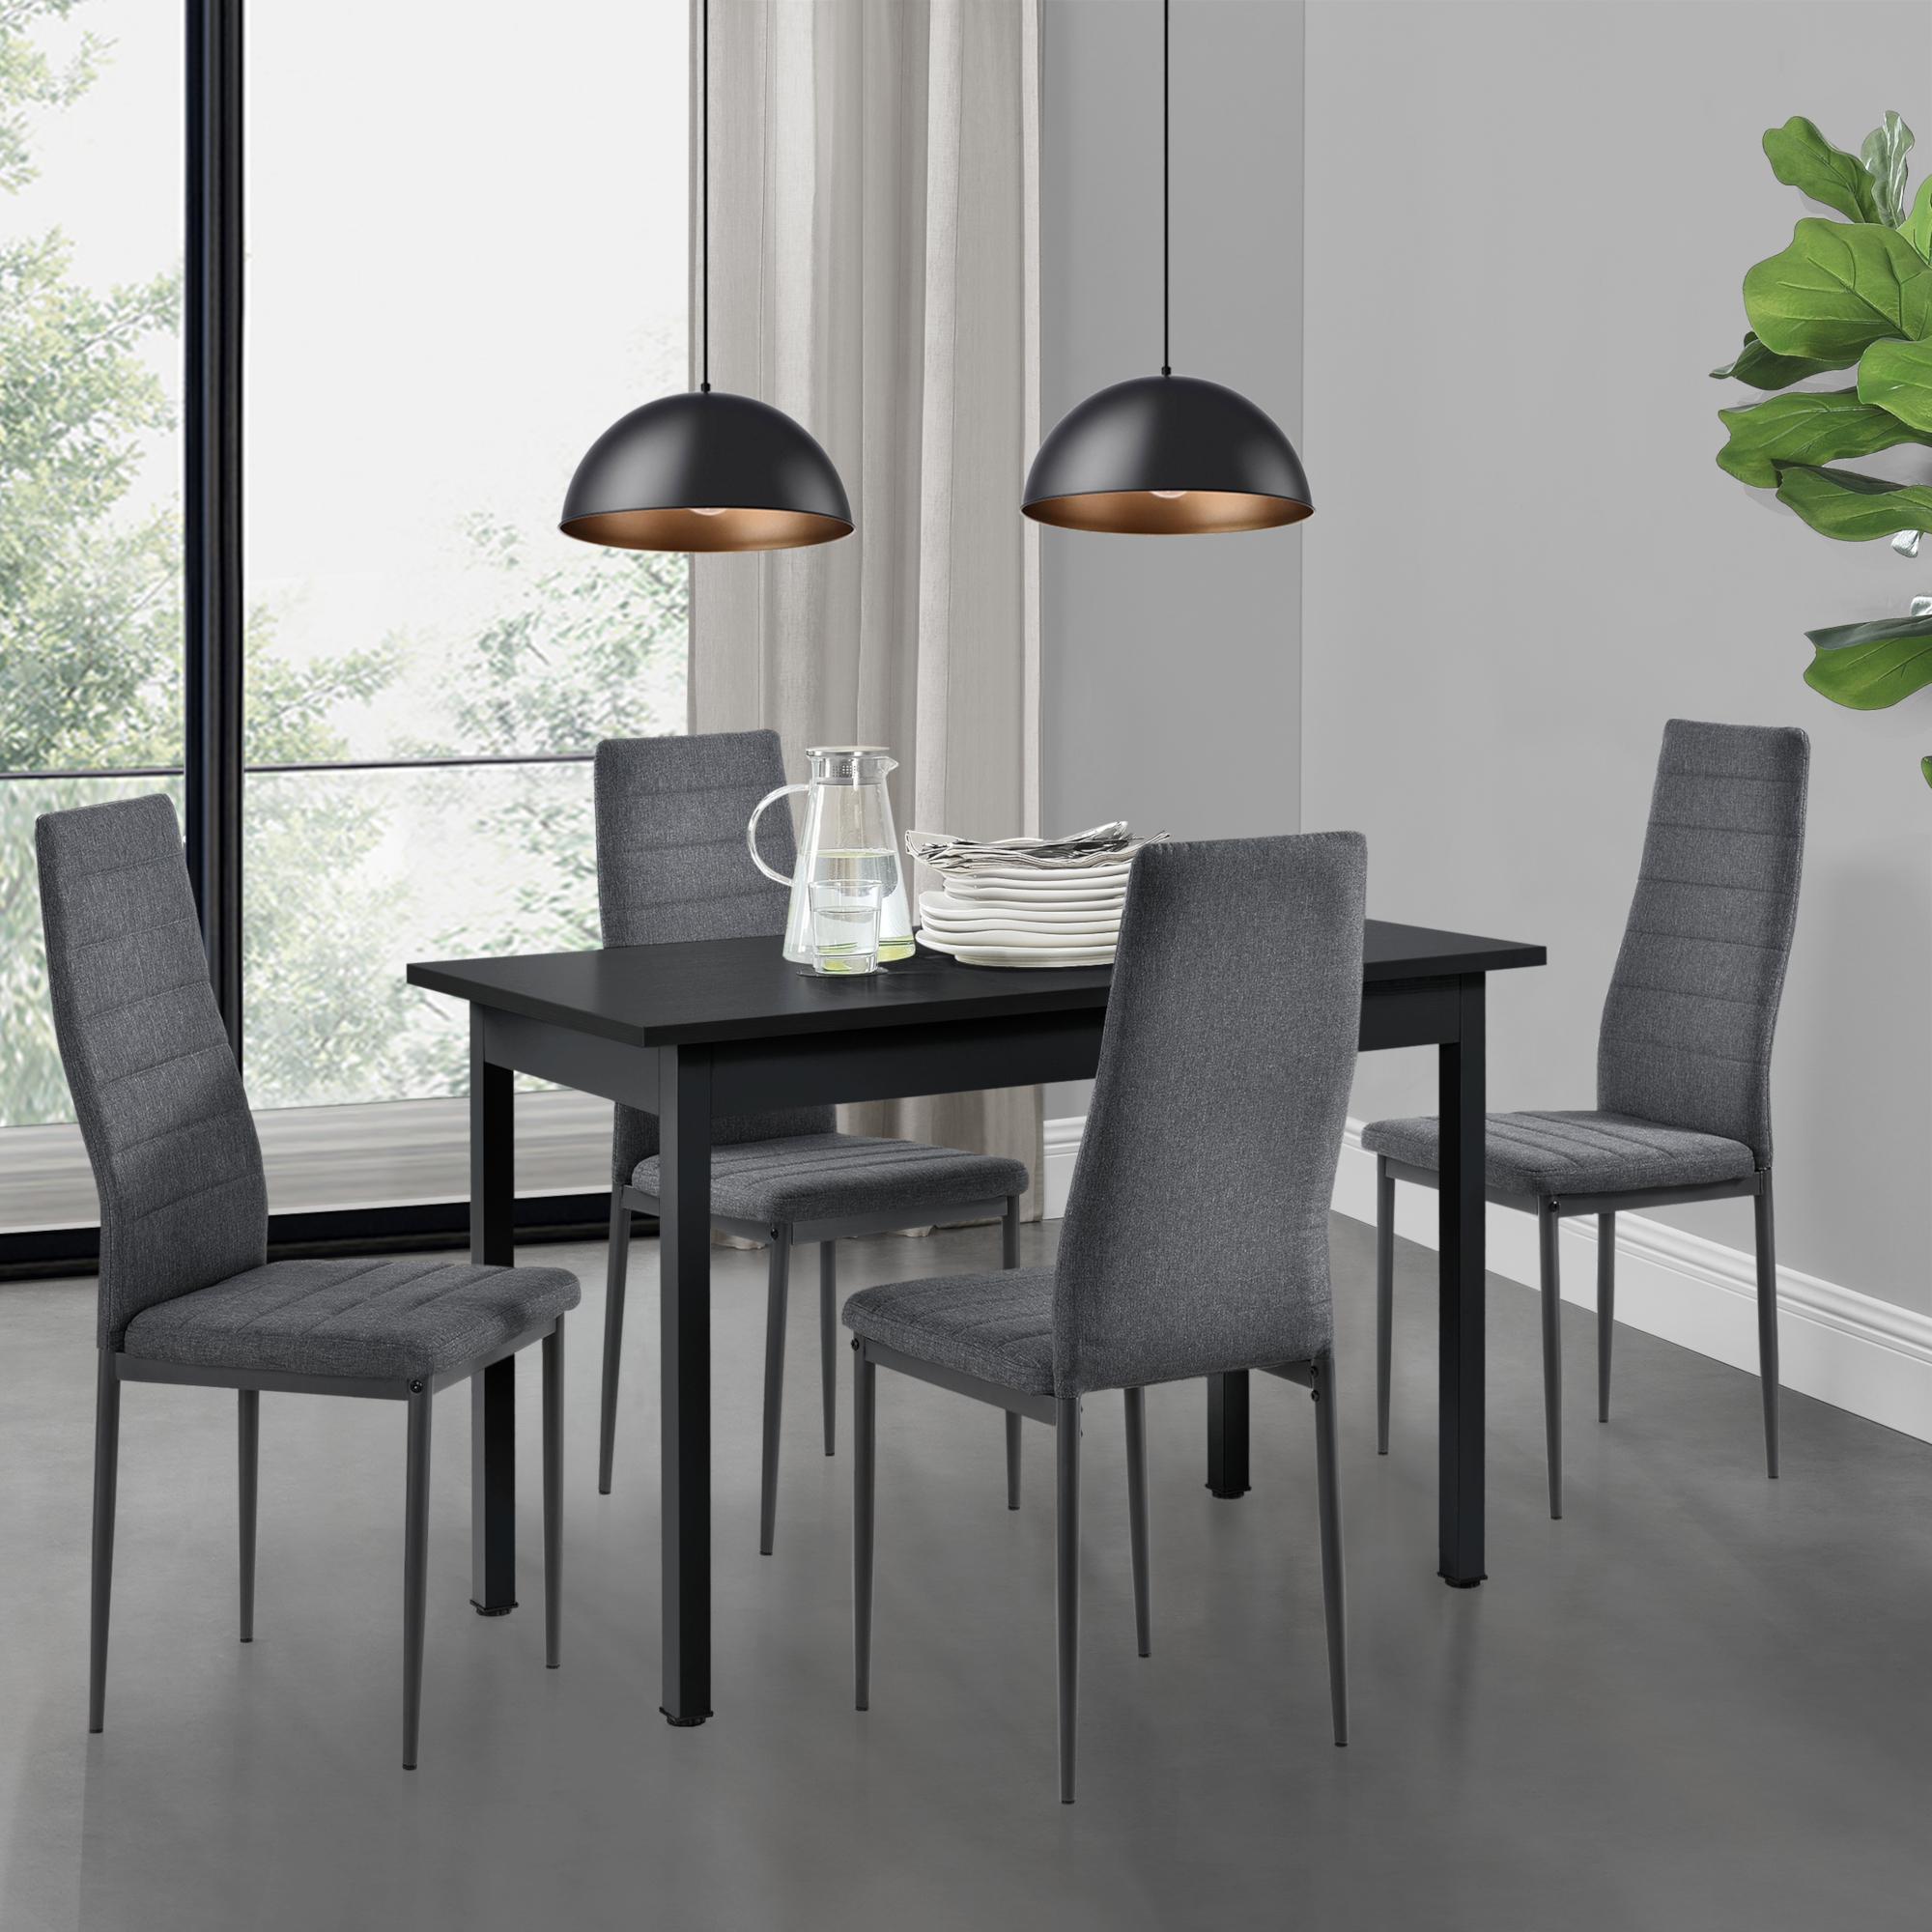 Detalles de [en.casa] Mesa de Comedor Minimalista 120cm x 60cm Negro Set de  4x Sillas diseño